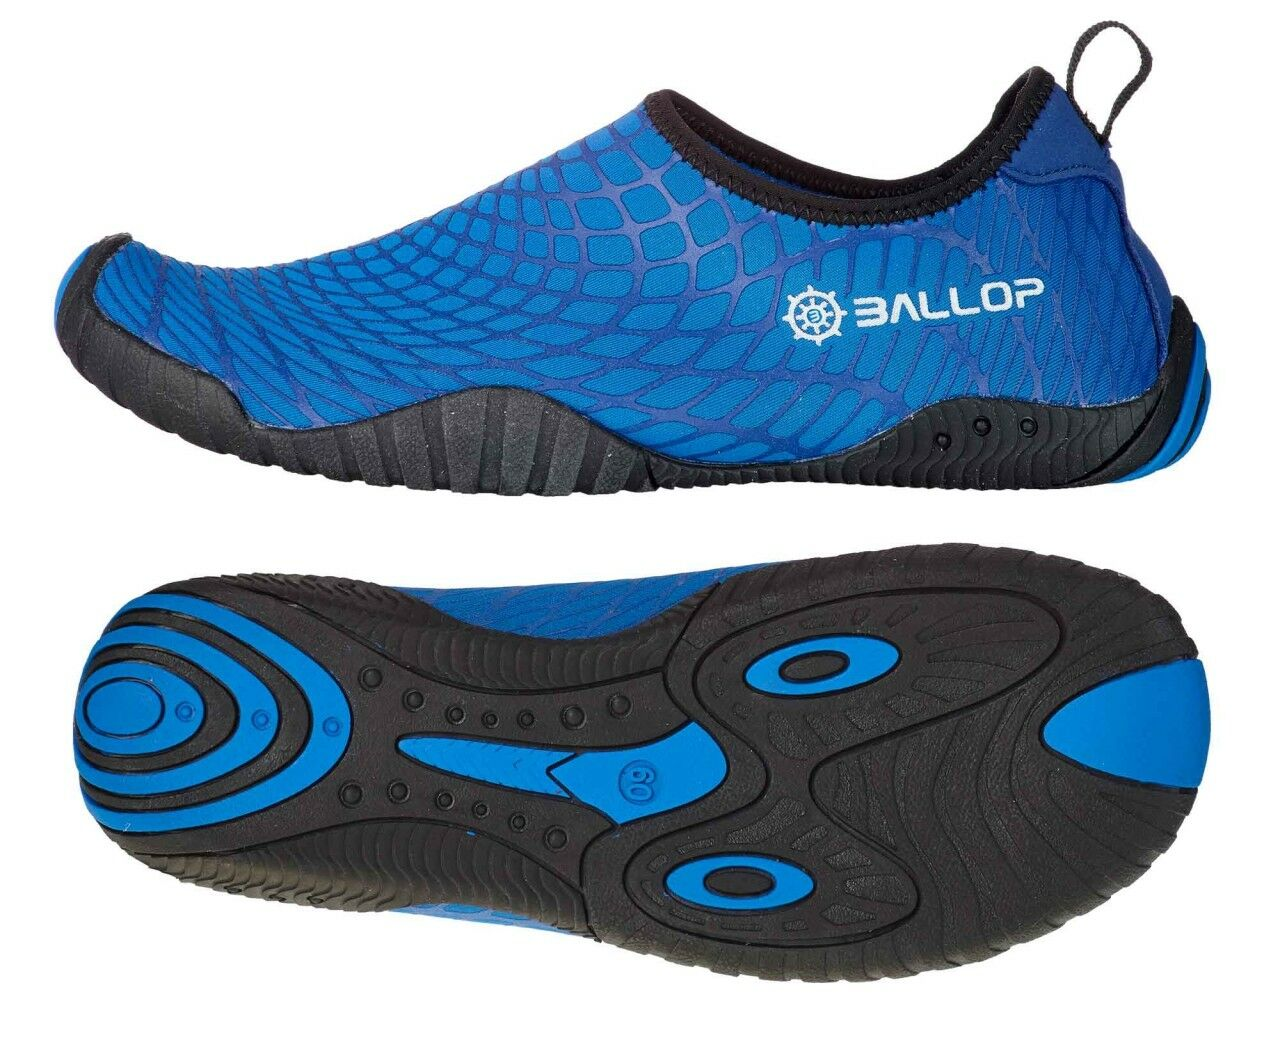 Ballop Sohle. Zapatos Spider Azul V2 Sohle. Ballop Functional Training,Sport,Gymnastik, Fitness 763fc3